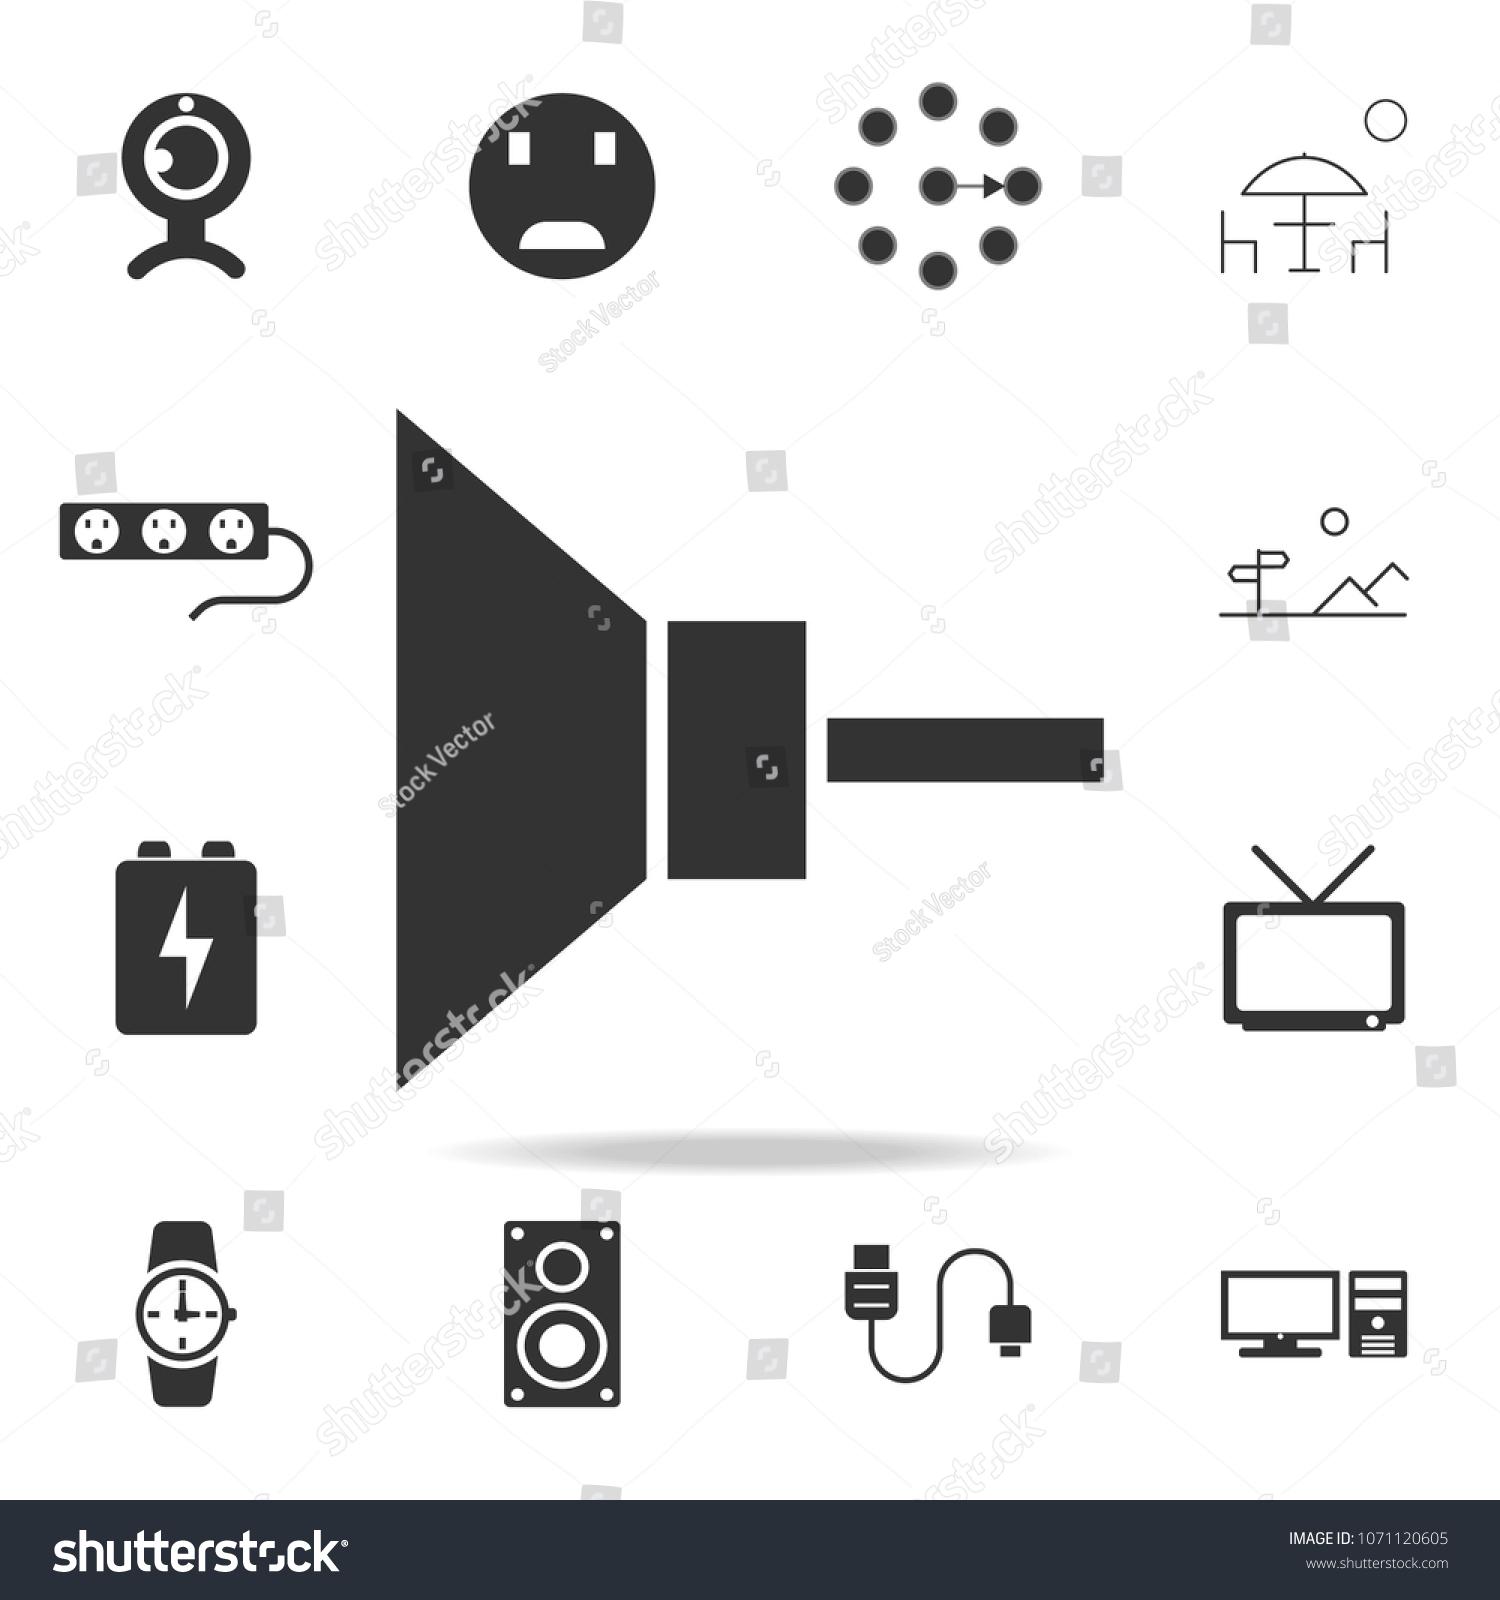 Electronic Circuit Symbol Icon Detailed Set Stock Vector Royalty Symbols Of Web Icons Premium Quality Graphic Design